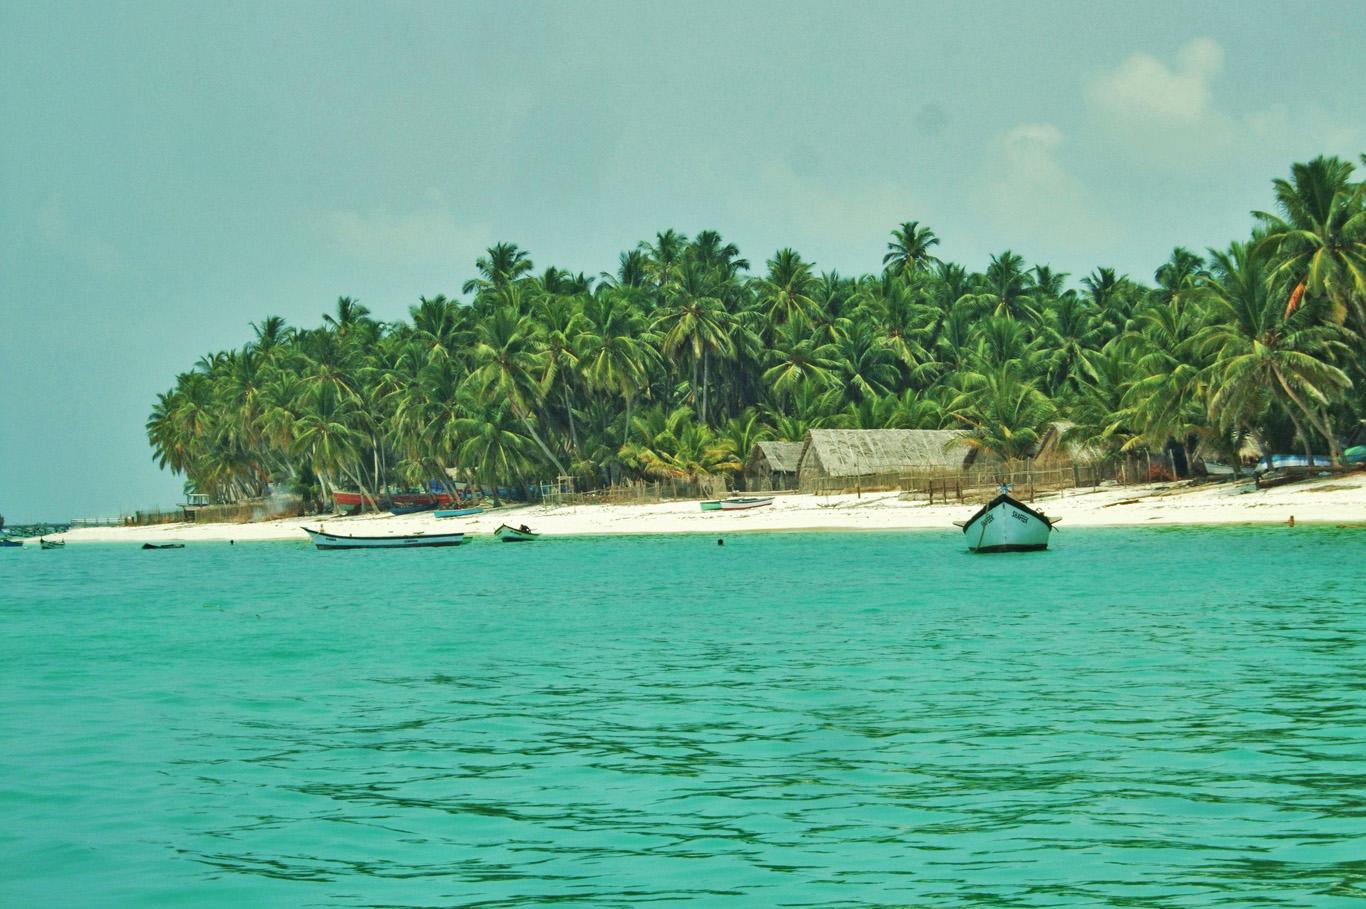 Agatti, Lakshadweep Islands